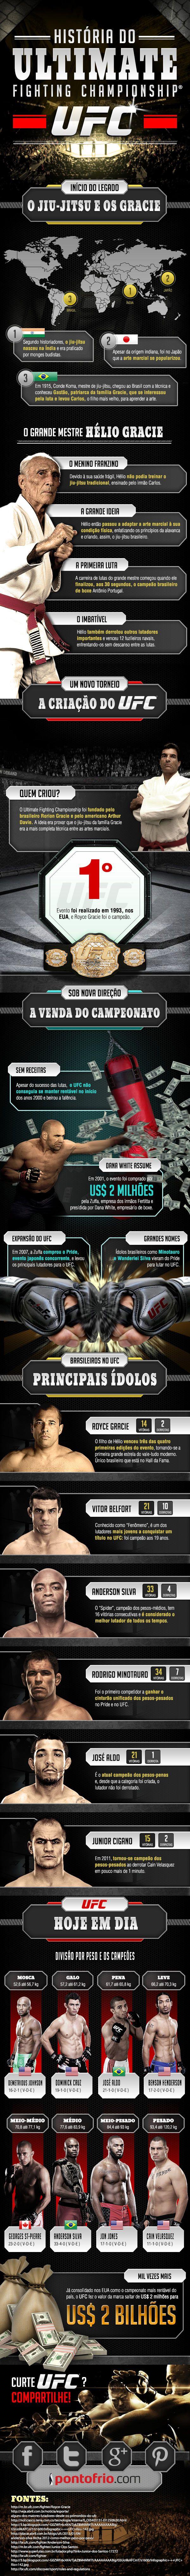 Super infográfico! A História do Ultimate Fighting Championship